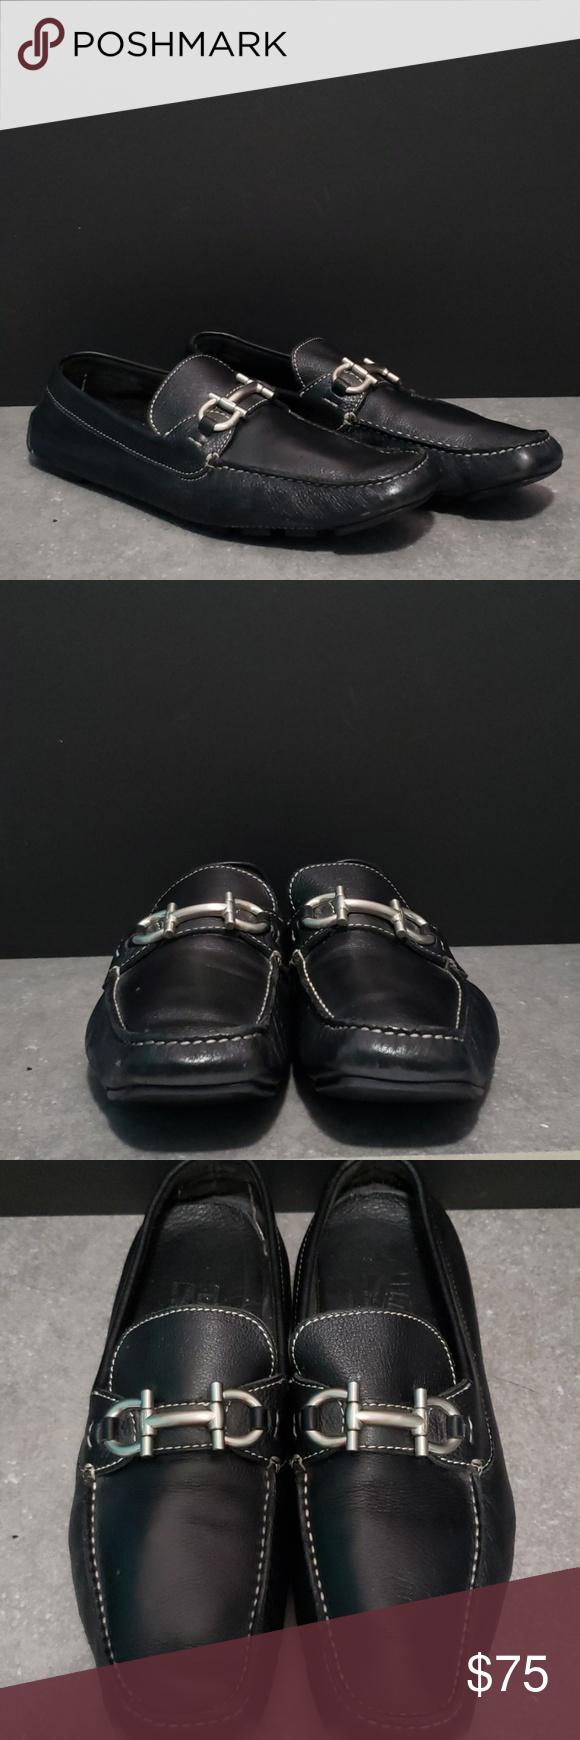 Salvatore ferragamo mens black leather